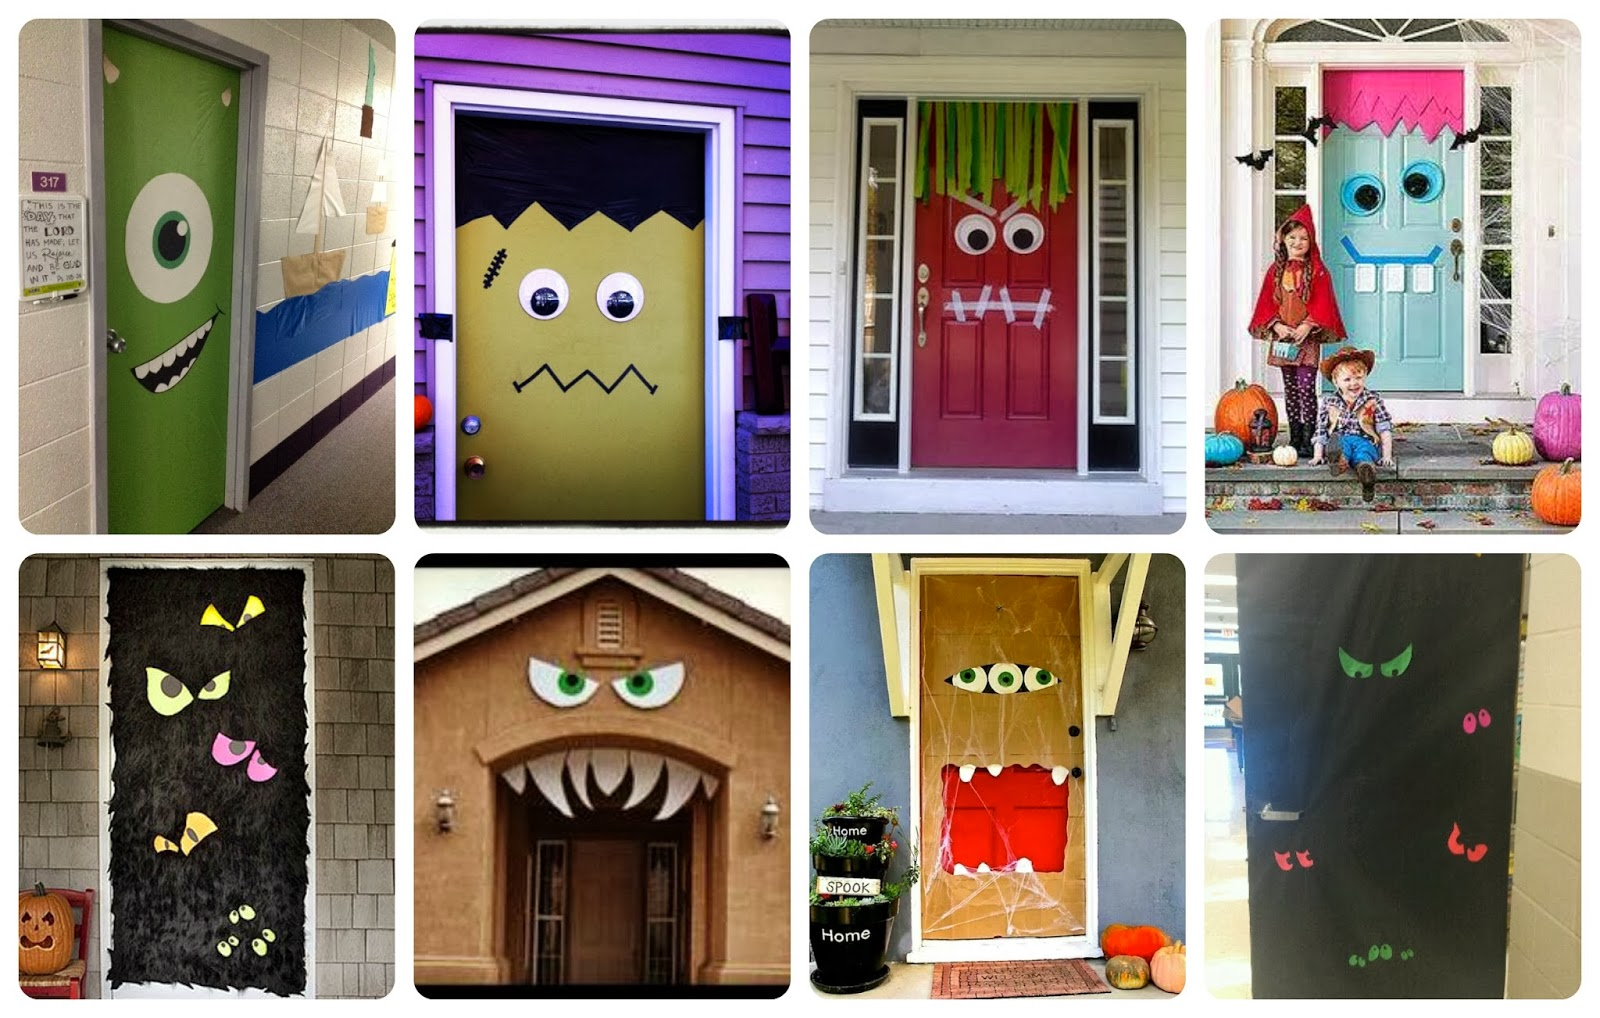 Halloween puertas 18 imagenes educativas for Puertas de halloween decoradas